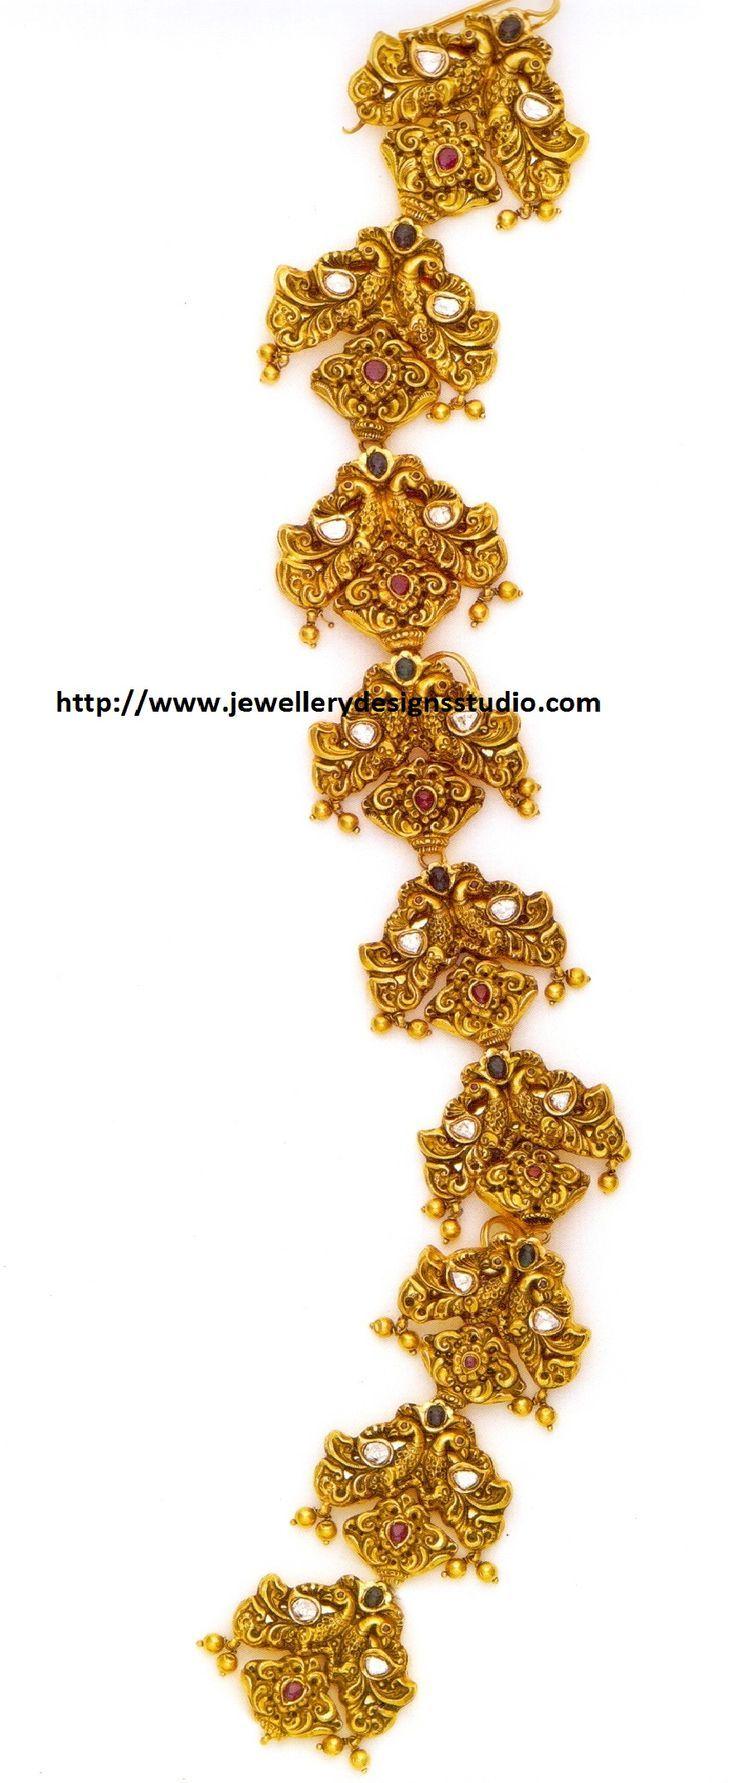 Pin by Neelofar Babar on Jewelry head omament | Pinterest | Jada ...